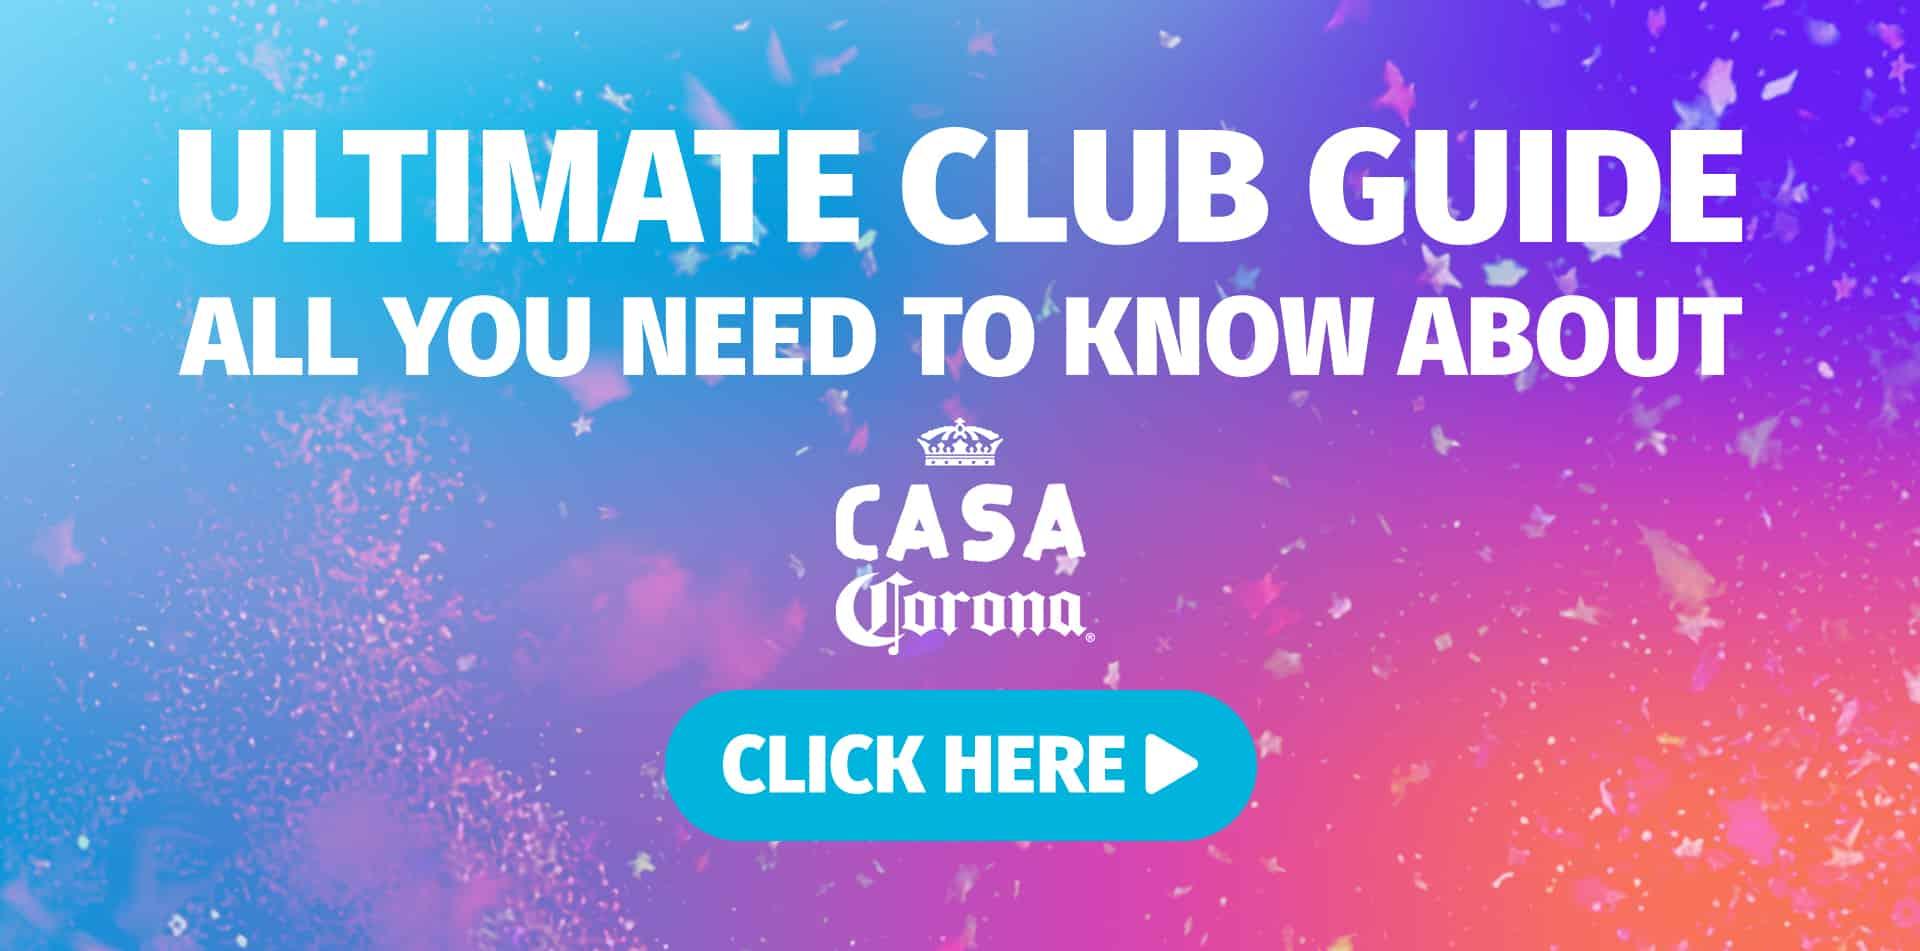 Club Guide Banner Casa Corona